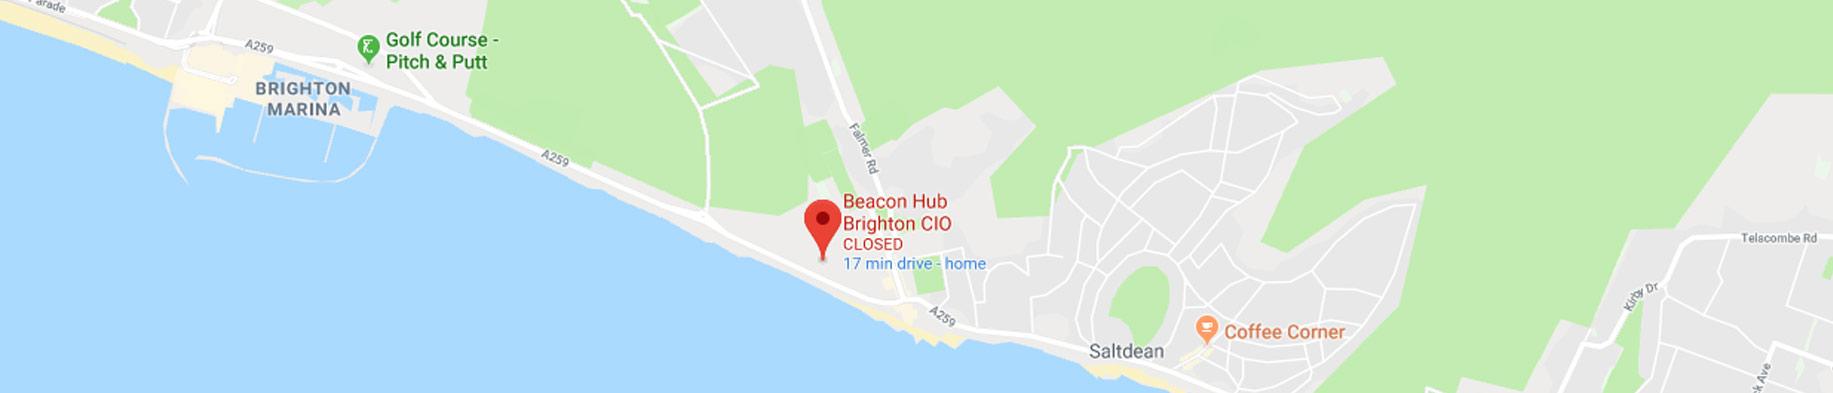 beacon hub rottingdean brighton sx